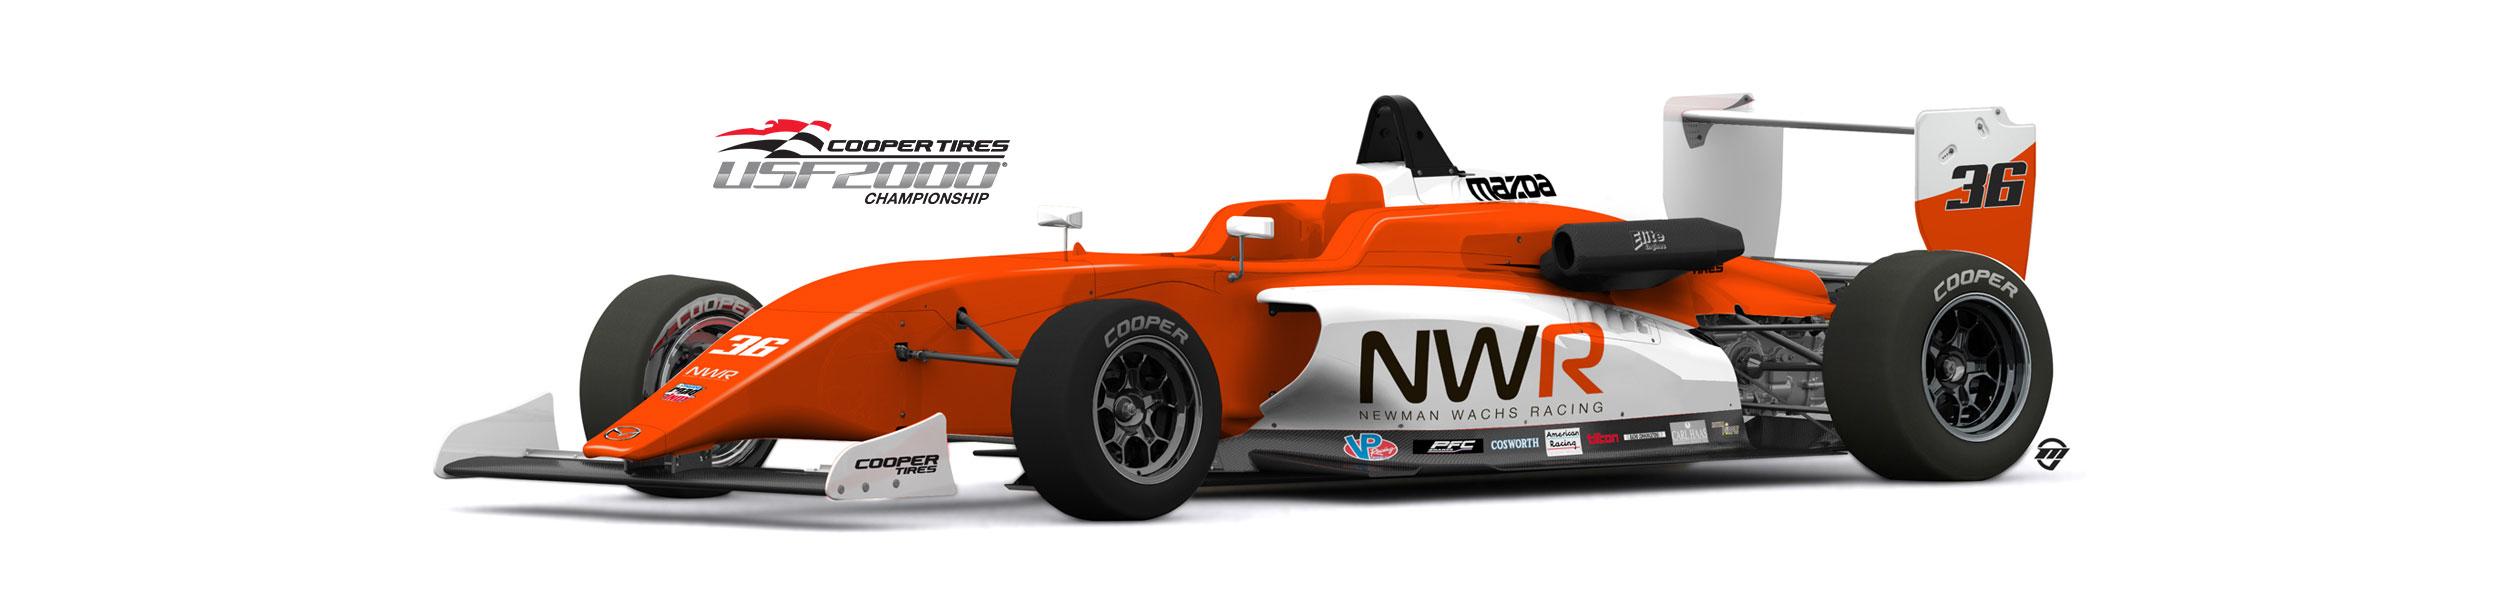 nwr-usf2000-rendering2_2500x600-2